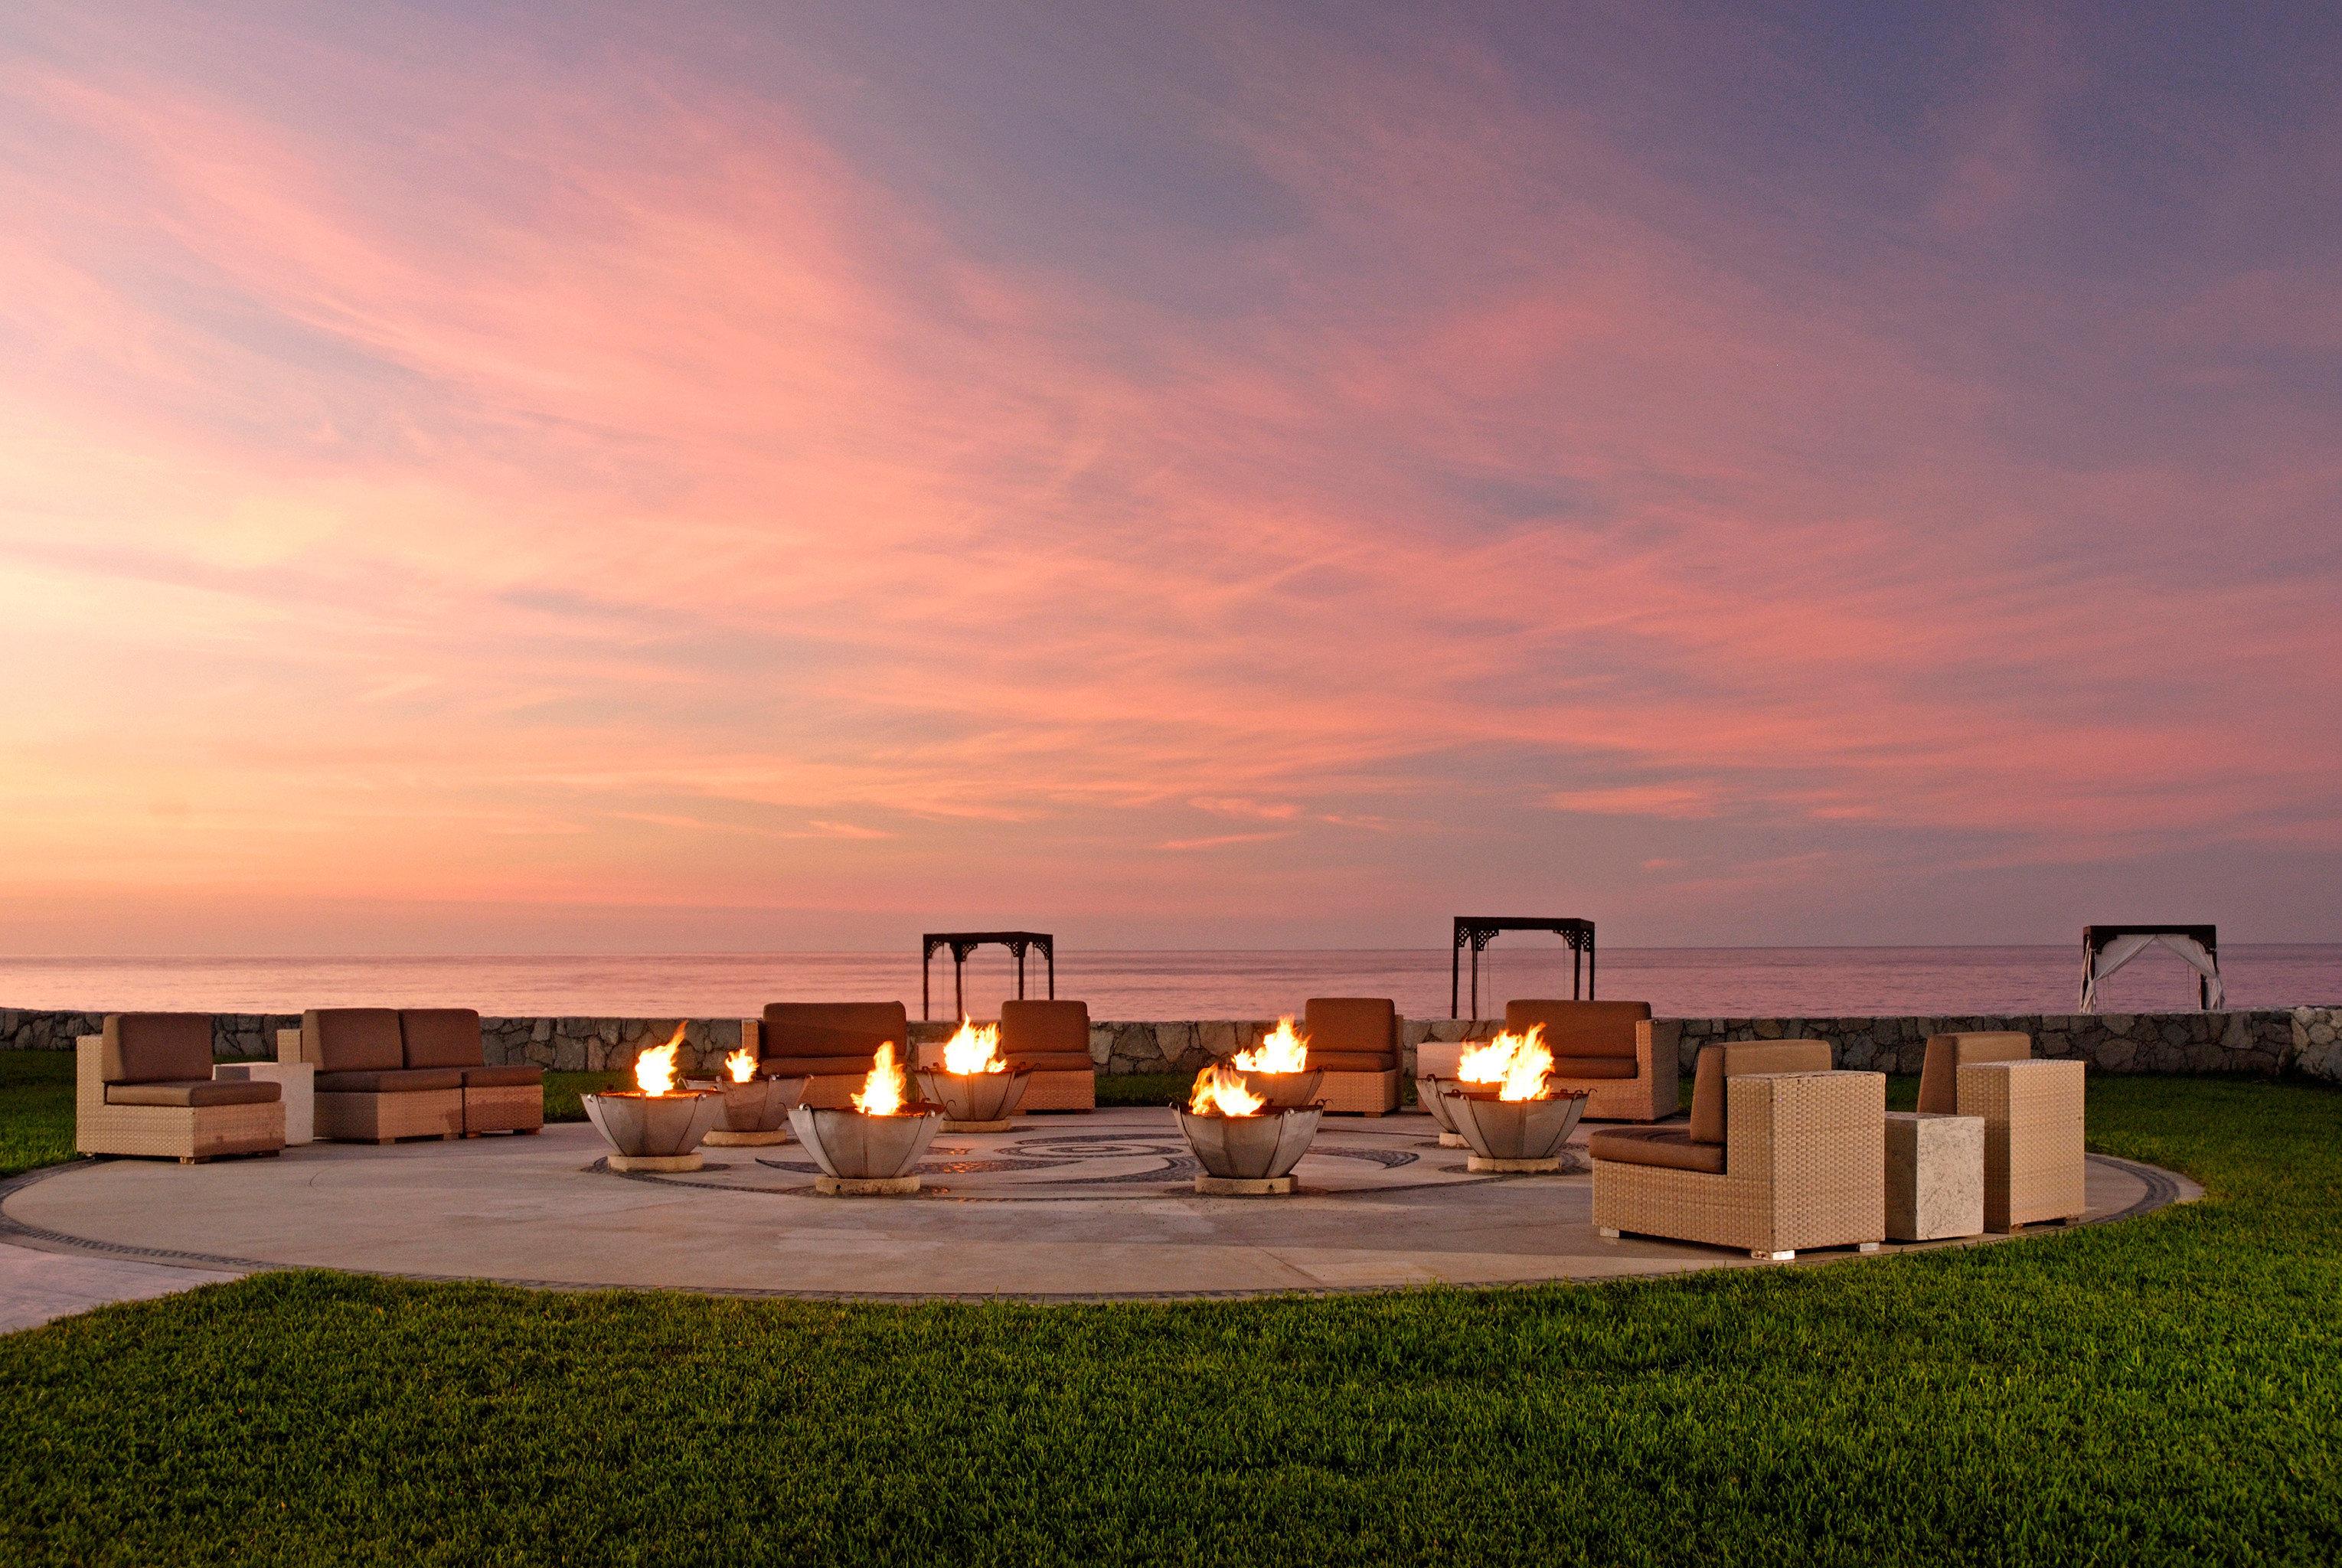 Adult-only All-inclusive Firepit Honeymoon Hotels Romance Romantic Tropical Waterfront sky grass horizon Sunset dusk evening sunrise morning dawn sunlight lighting Sea